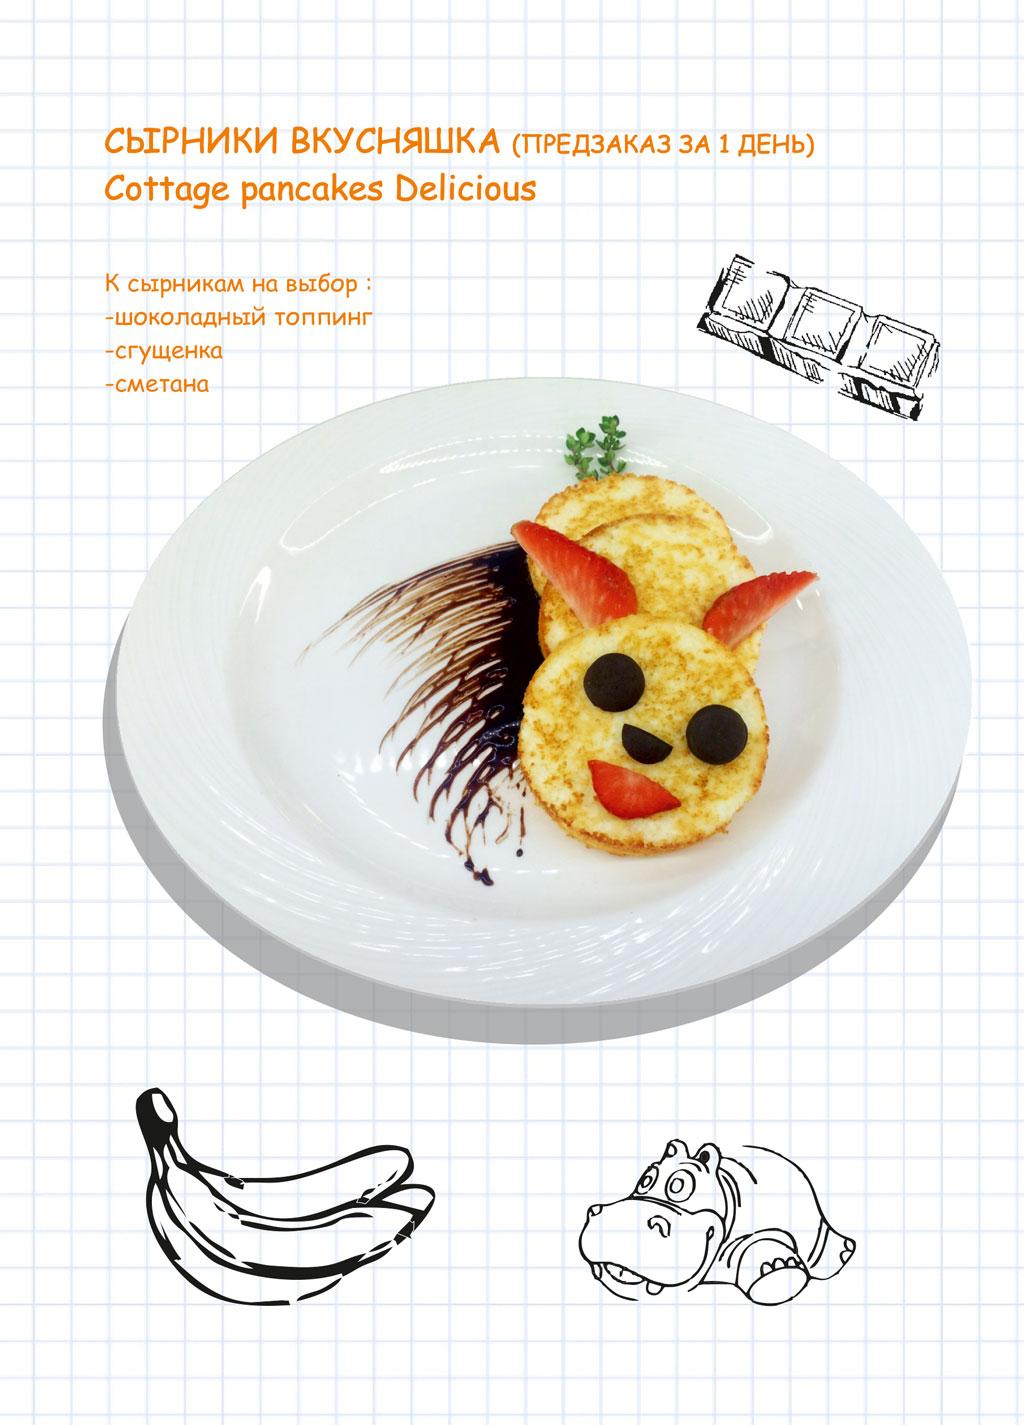 Cырники Вкусняшка (предзаказ за 1 день) (Сottage pancakes Delicious) в ресторане Аннам Брахма в Оренбурге